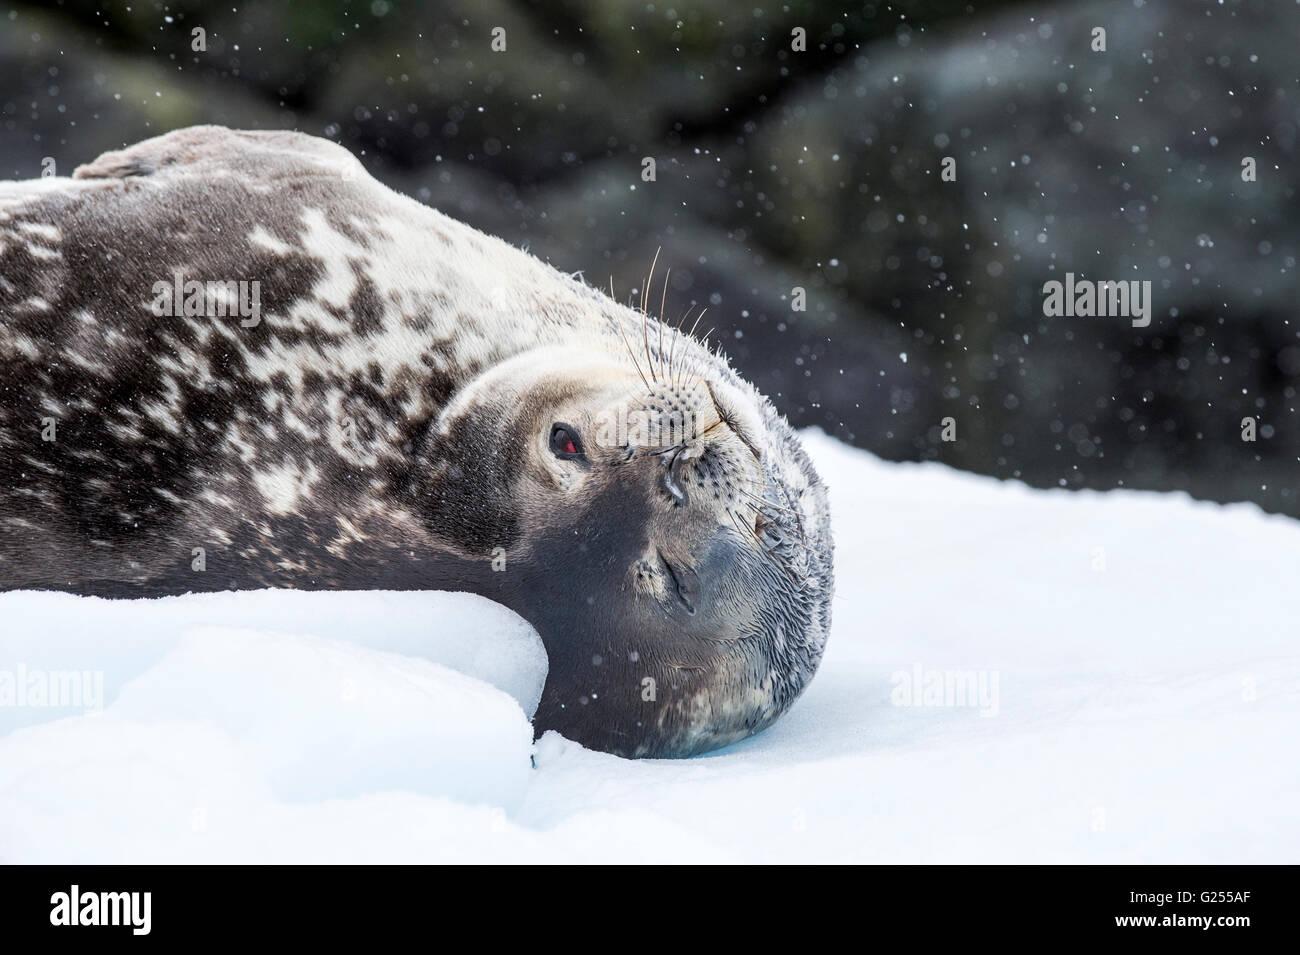 Weddell Seal sleeping Paradise Bay, Antarctica - Stock Image